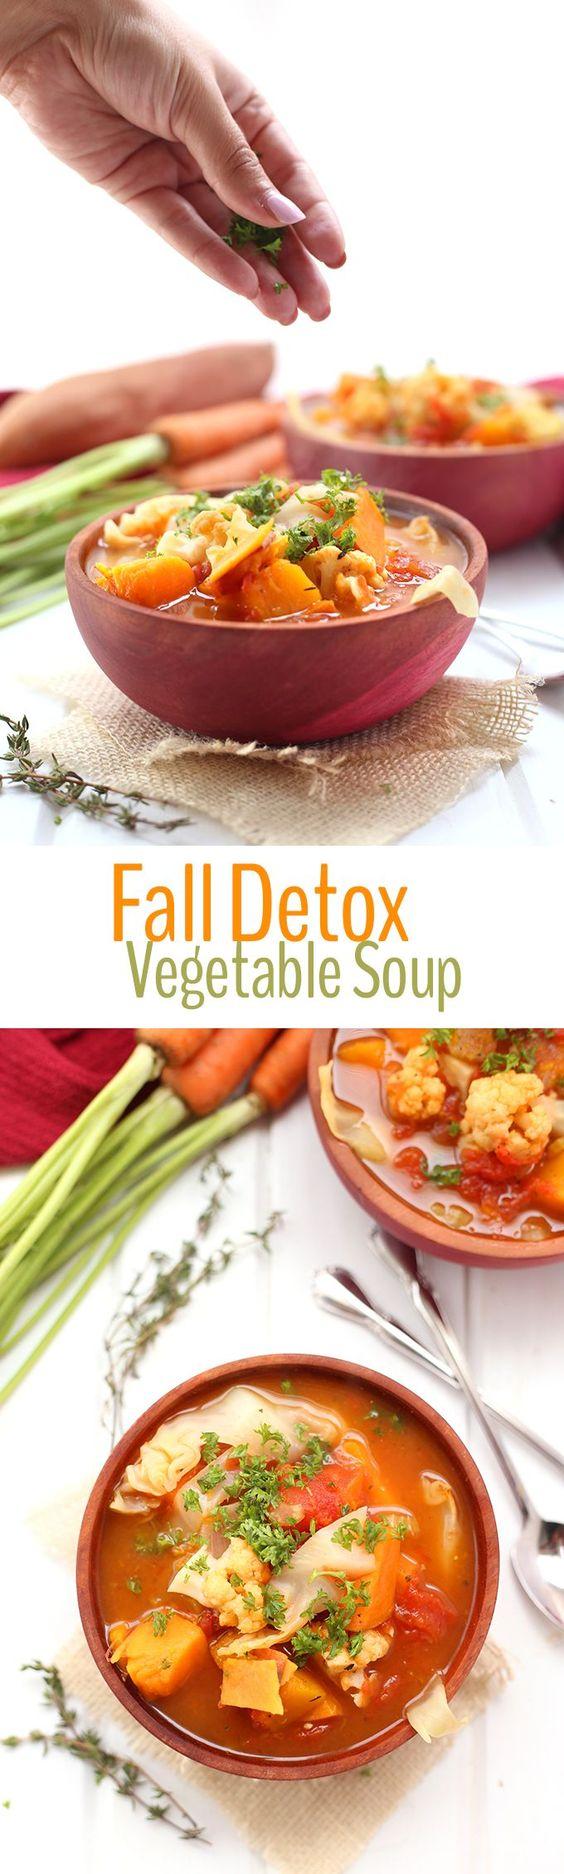 Fall Detox Vegetable Soup Recipe